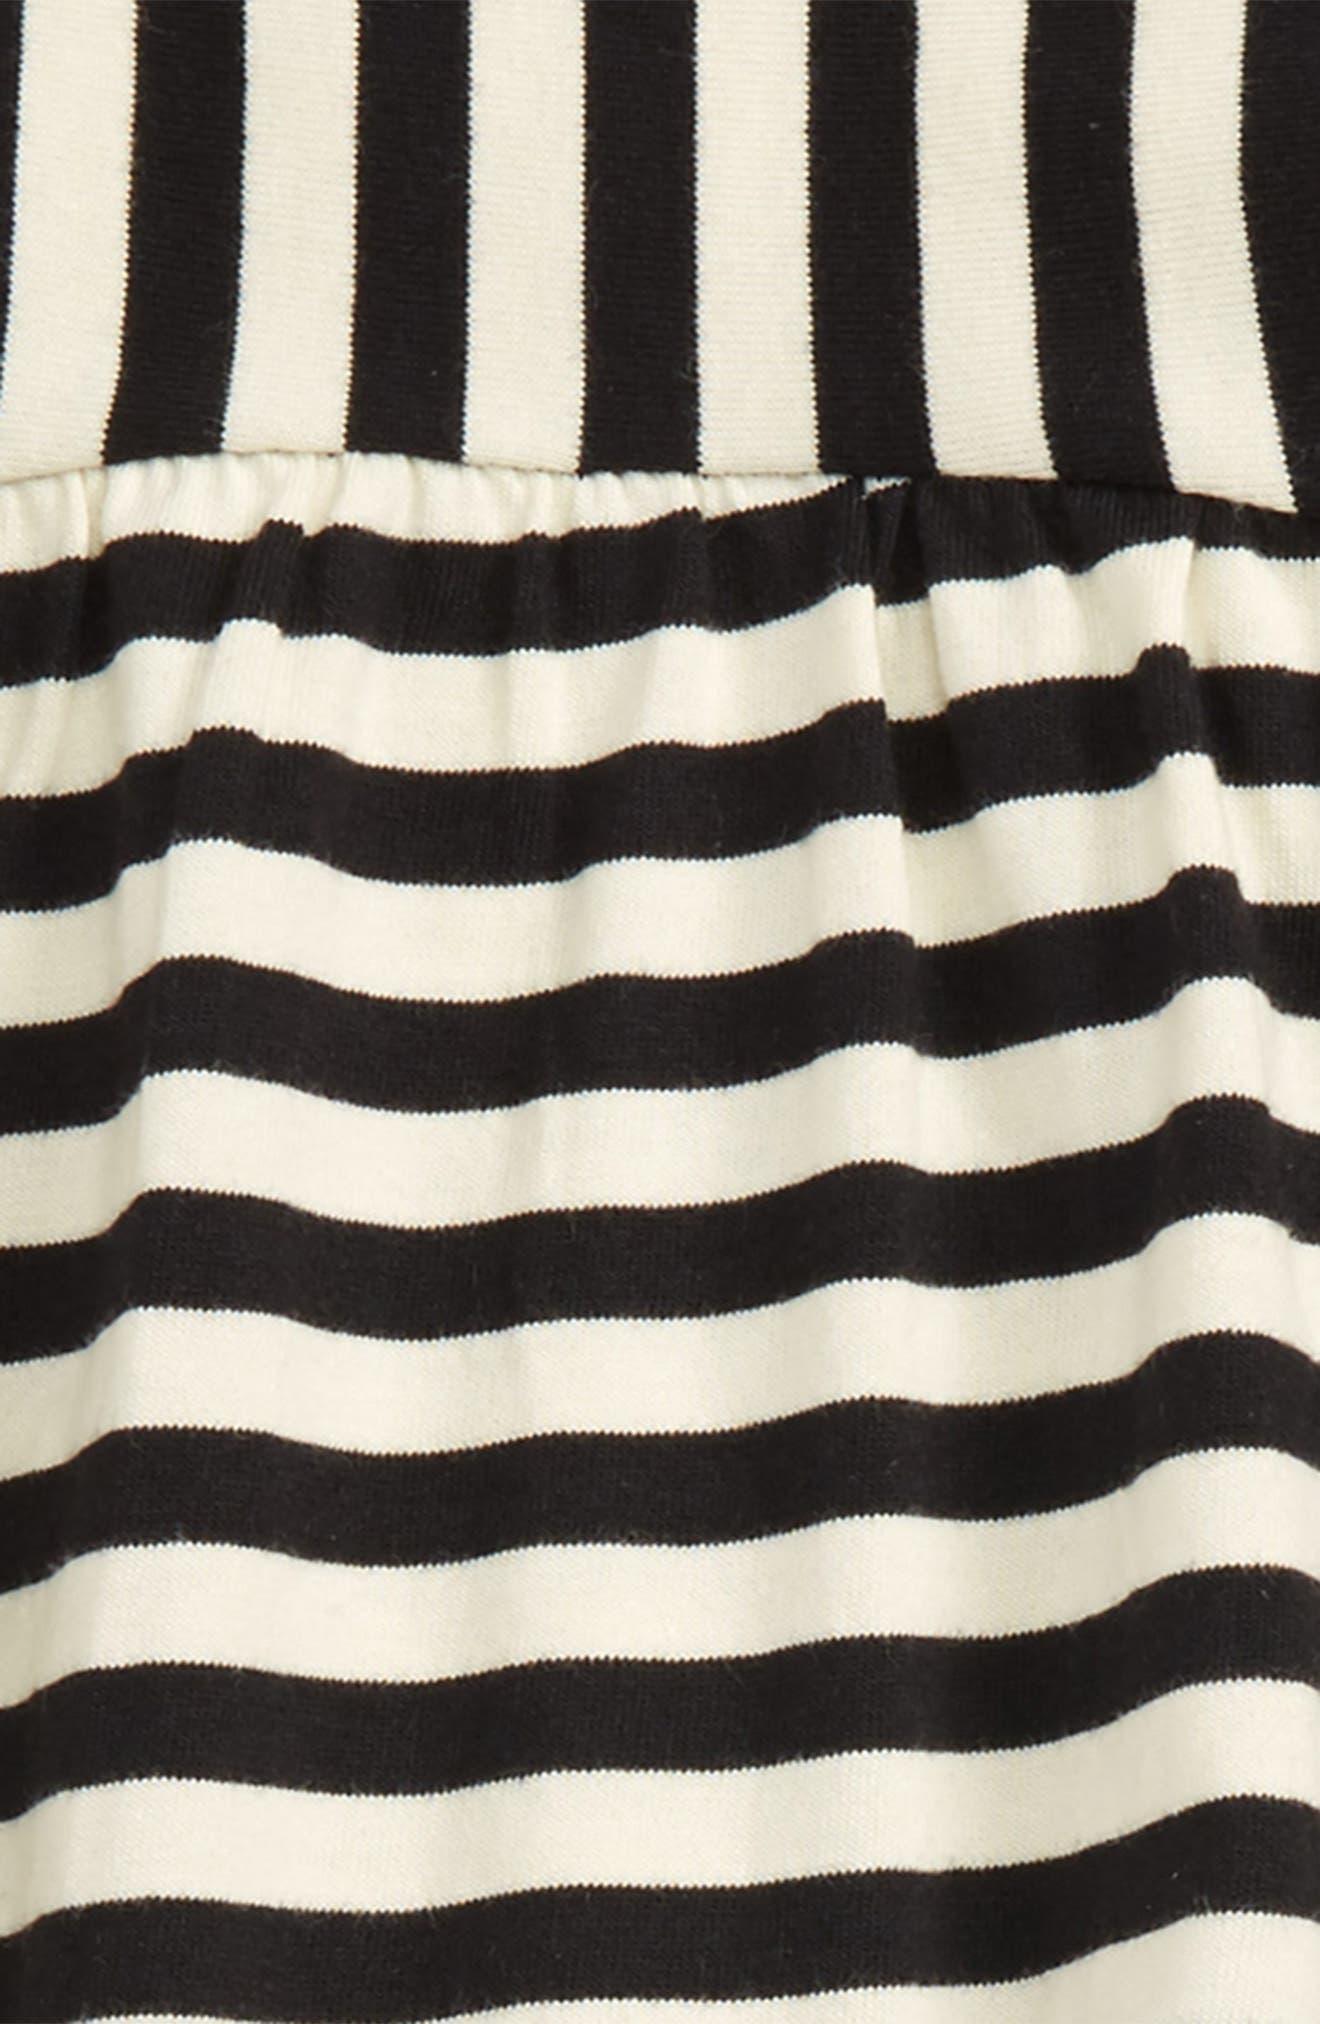 Jura Stripe Top & Leggings Set,                             Alternate thumbnail 2, color,                             001